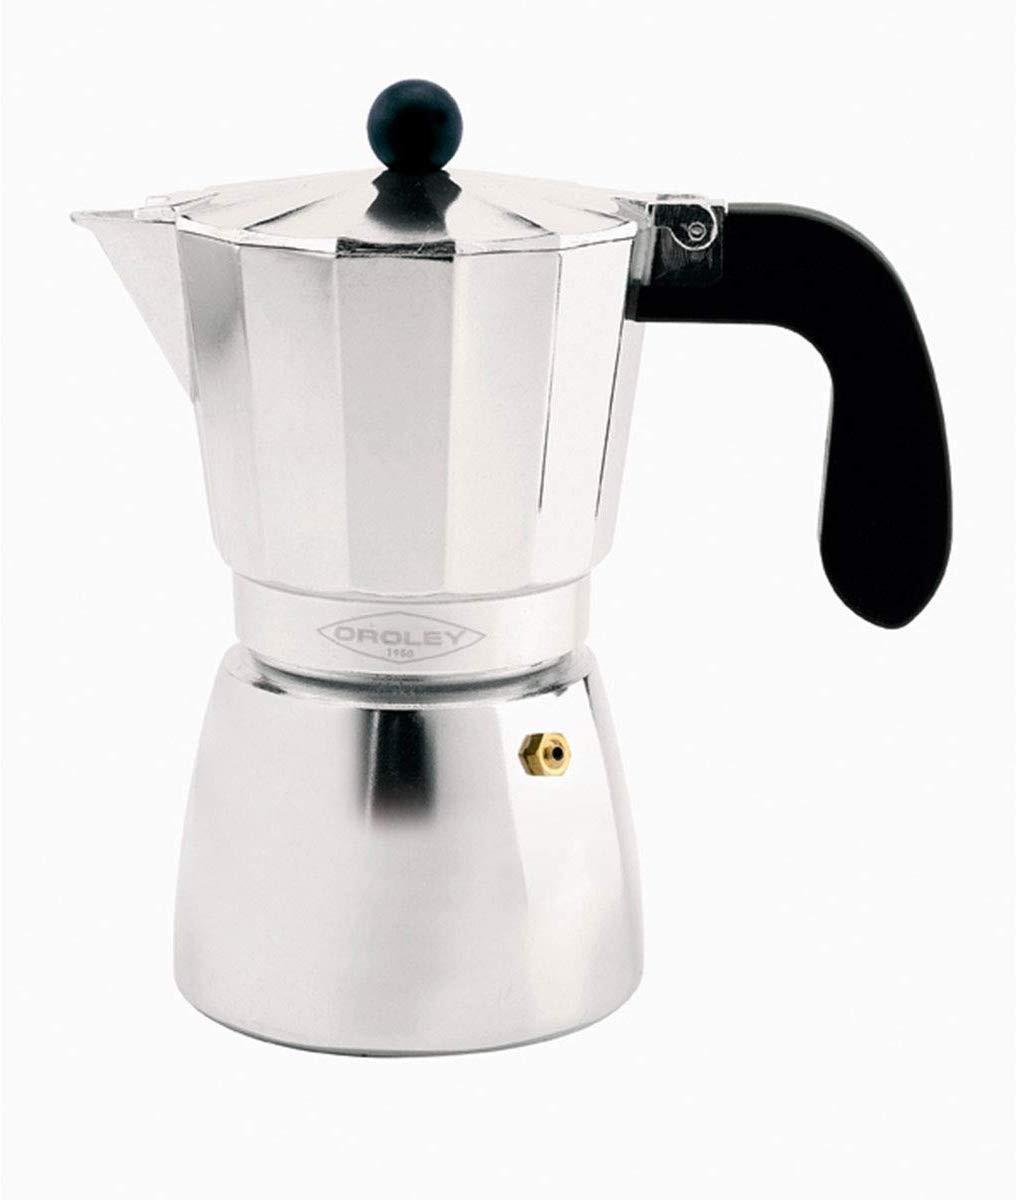 Oroley ALU Cafetera Italiana 6 Tazas aluminio para todo tipo de Cocinas menos inducción